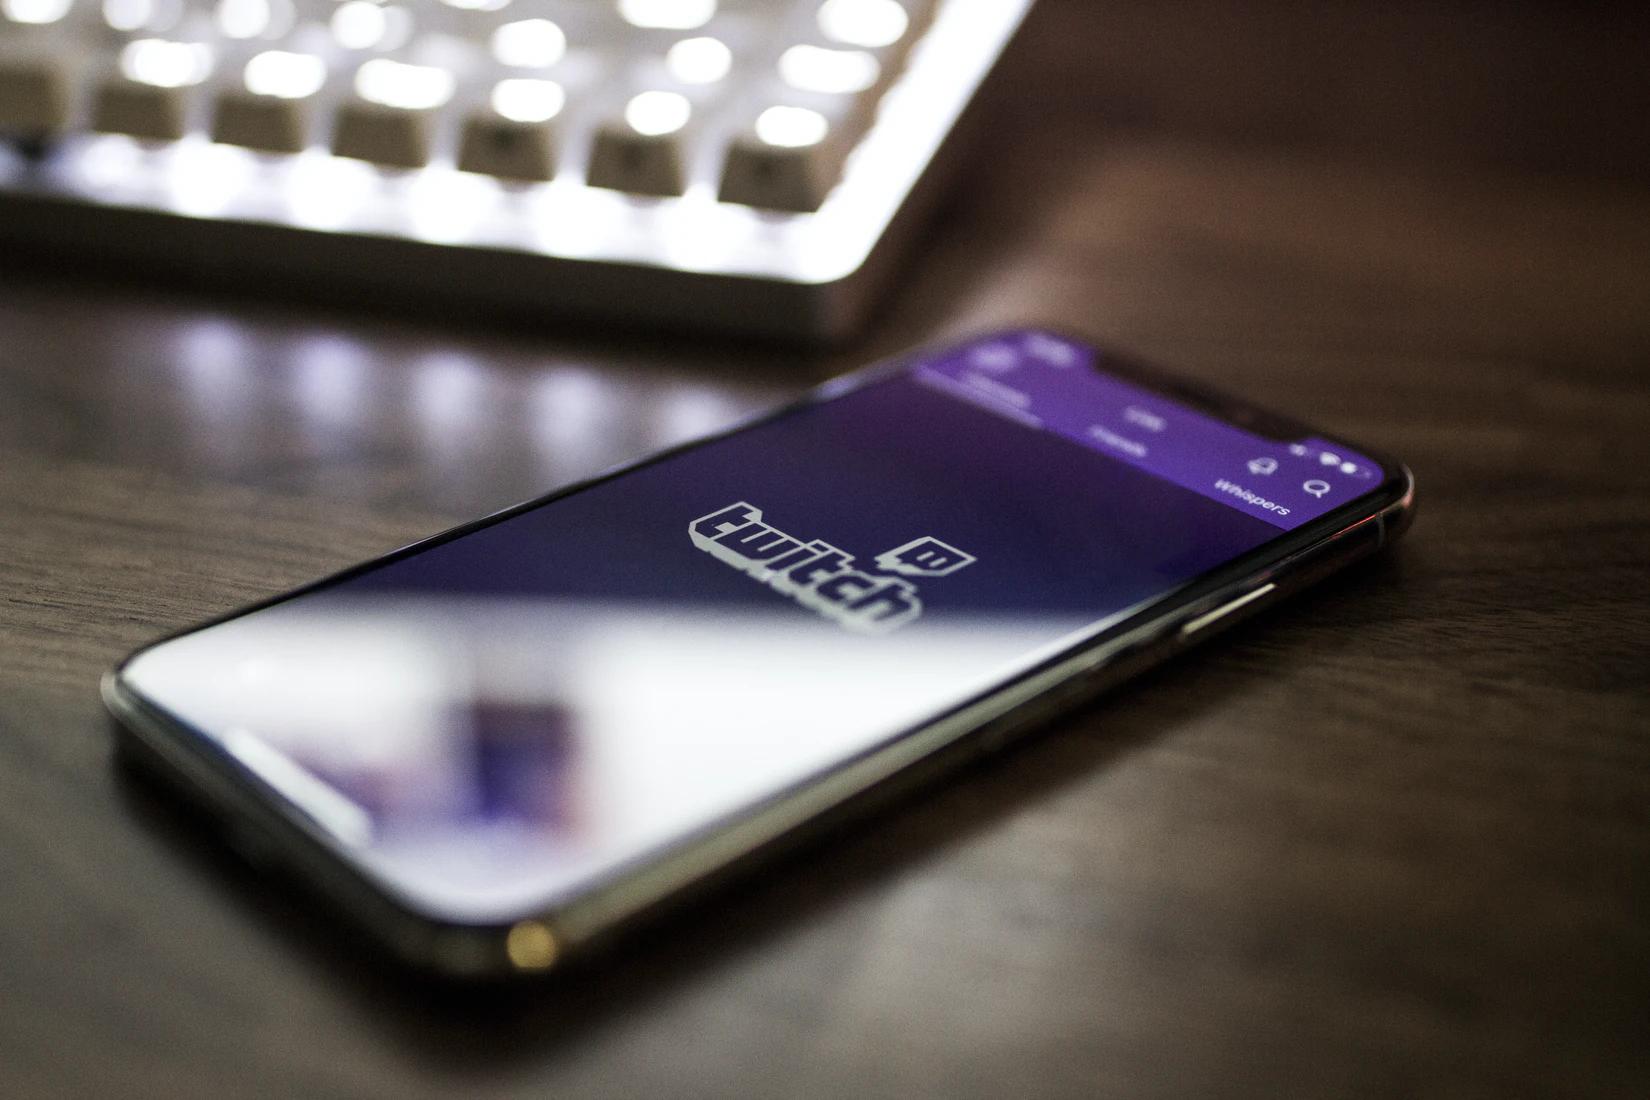 Twitch iOS App on iPhoneX - Caspar Camille Rubin